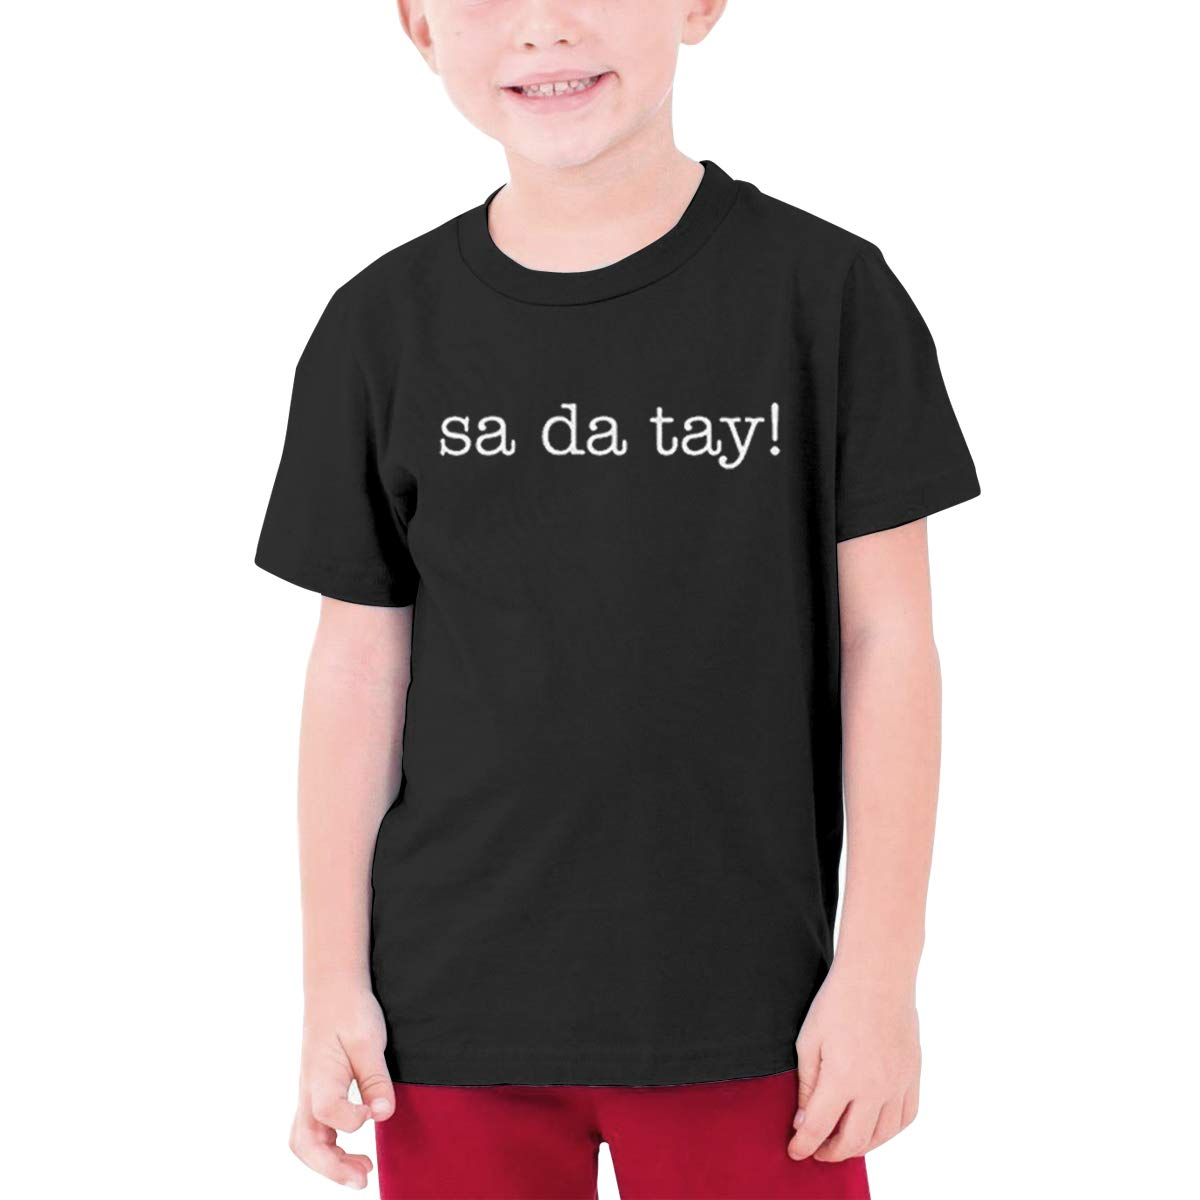 Kids Soft Cotton T Shirt Sa-Da-Tay Stylish Crewneck Short Sleeve Tops Black